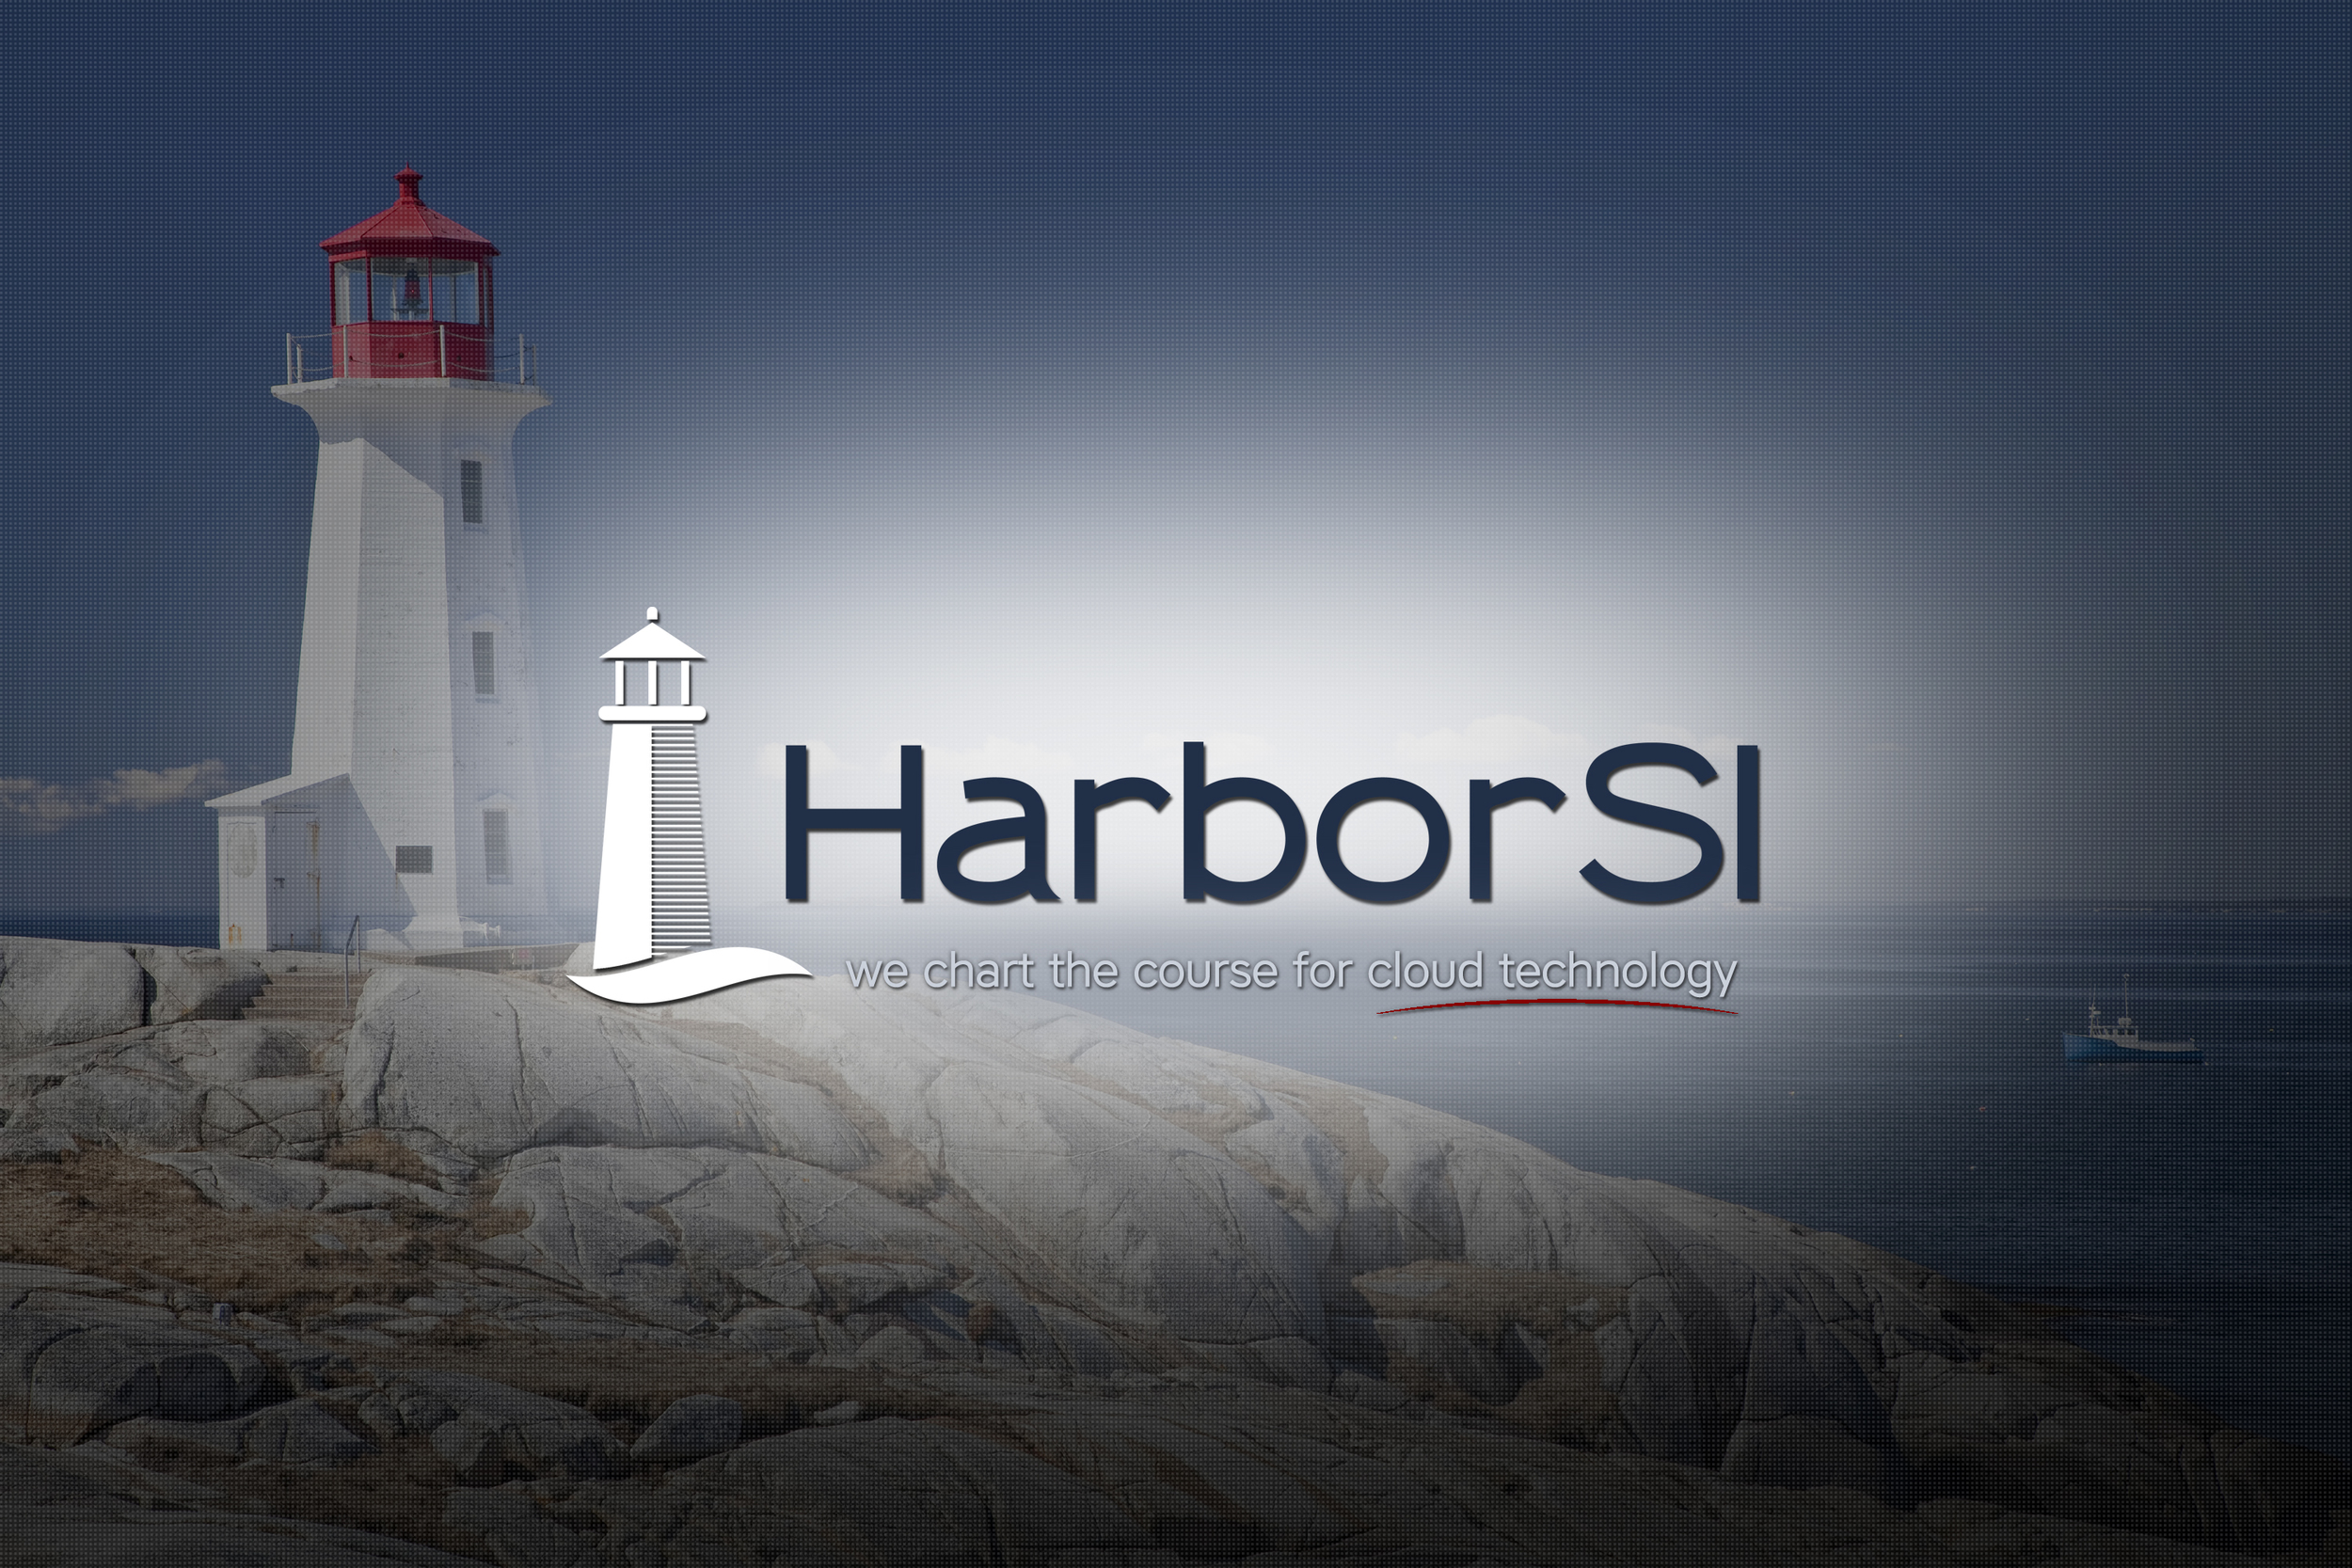 z_Harbor [v14]  [NEW Tagline - tight white at 2px] SI Splash Page and Tagline by Graham Hnedak Brand G Creative 02 OCT 2014.jpg